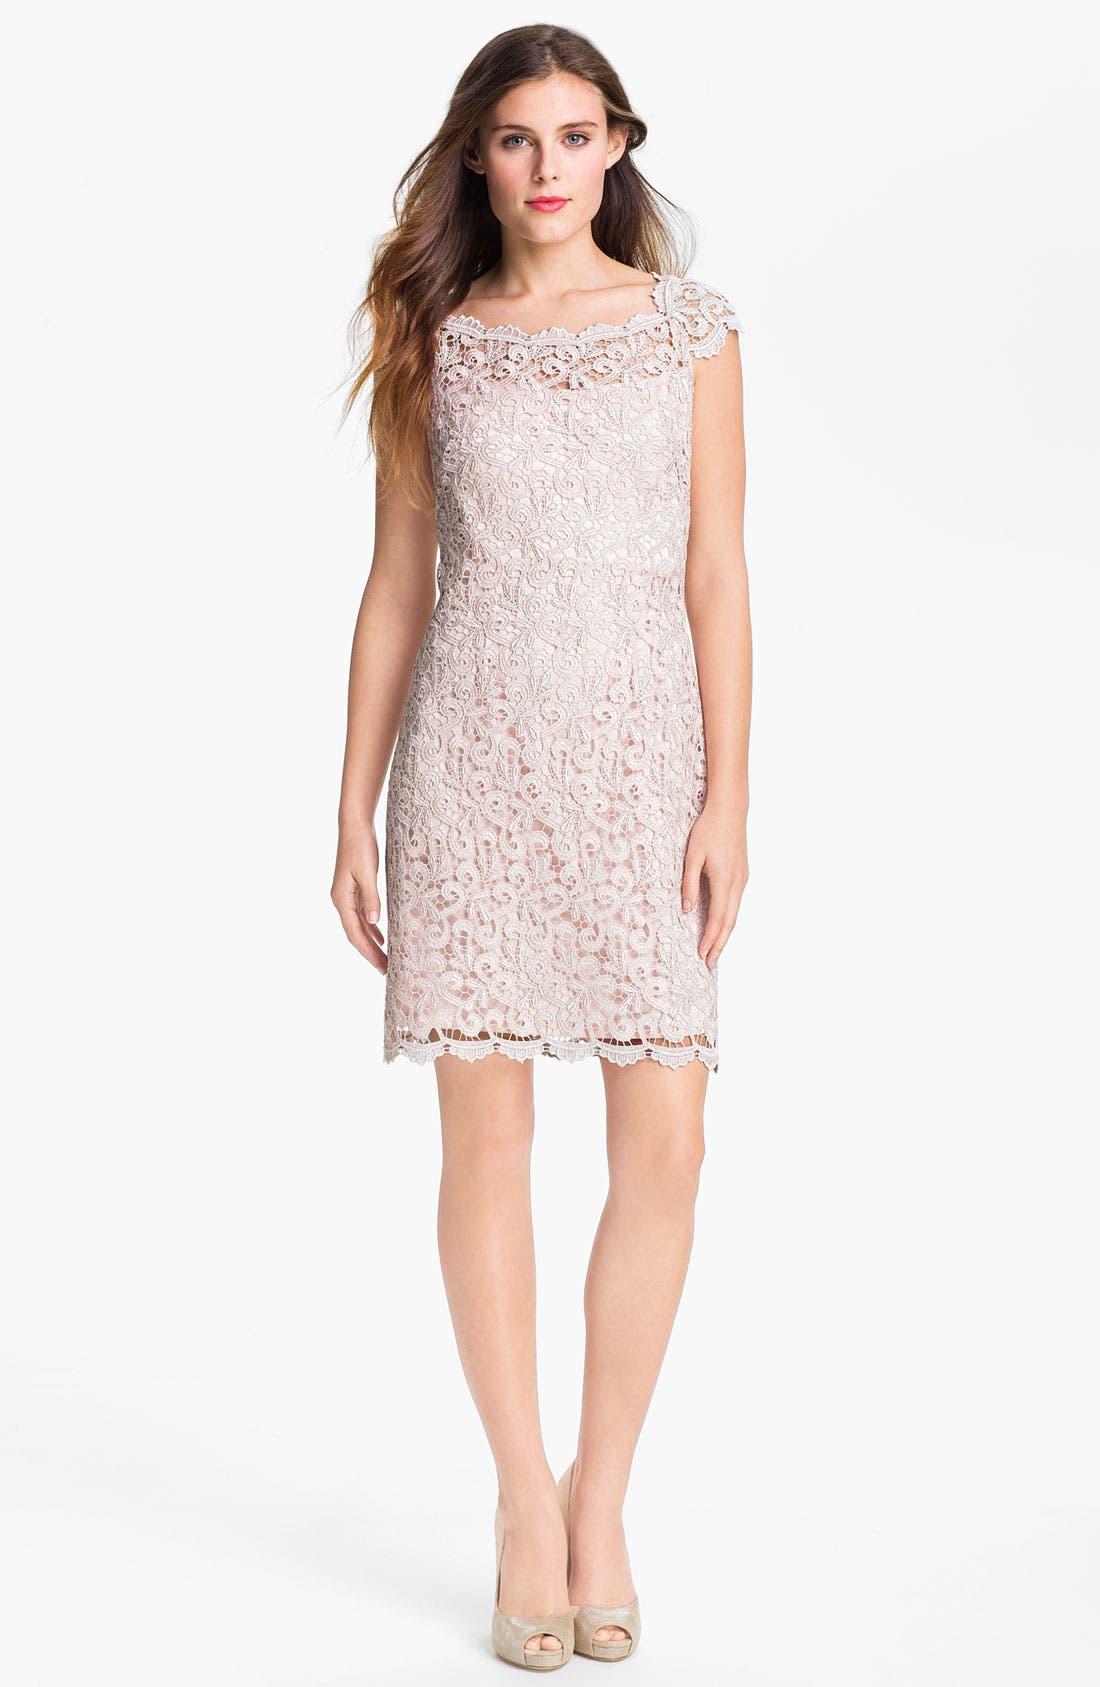 Main Image - Suzi Chin for Maggy Boutique Scalloped Lace Sheath Dress